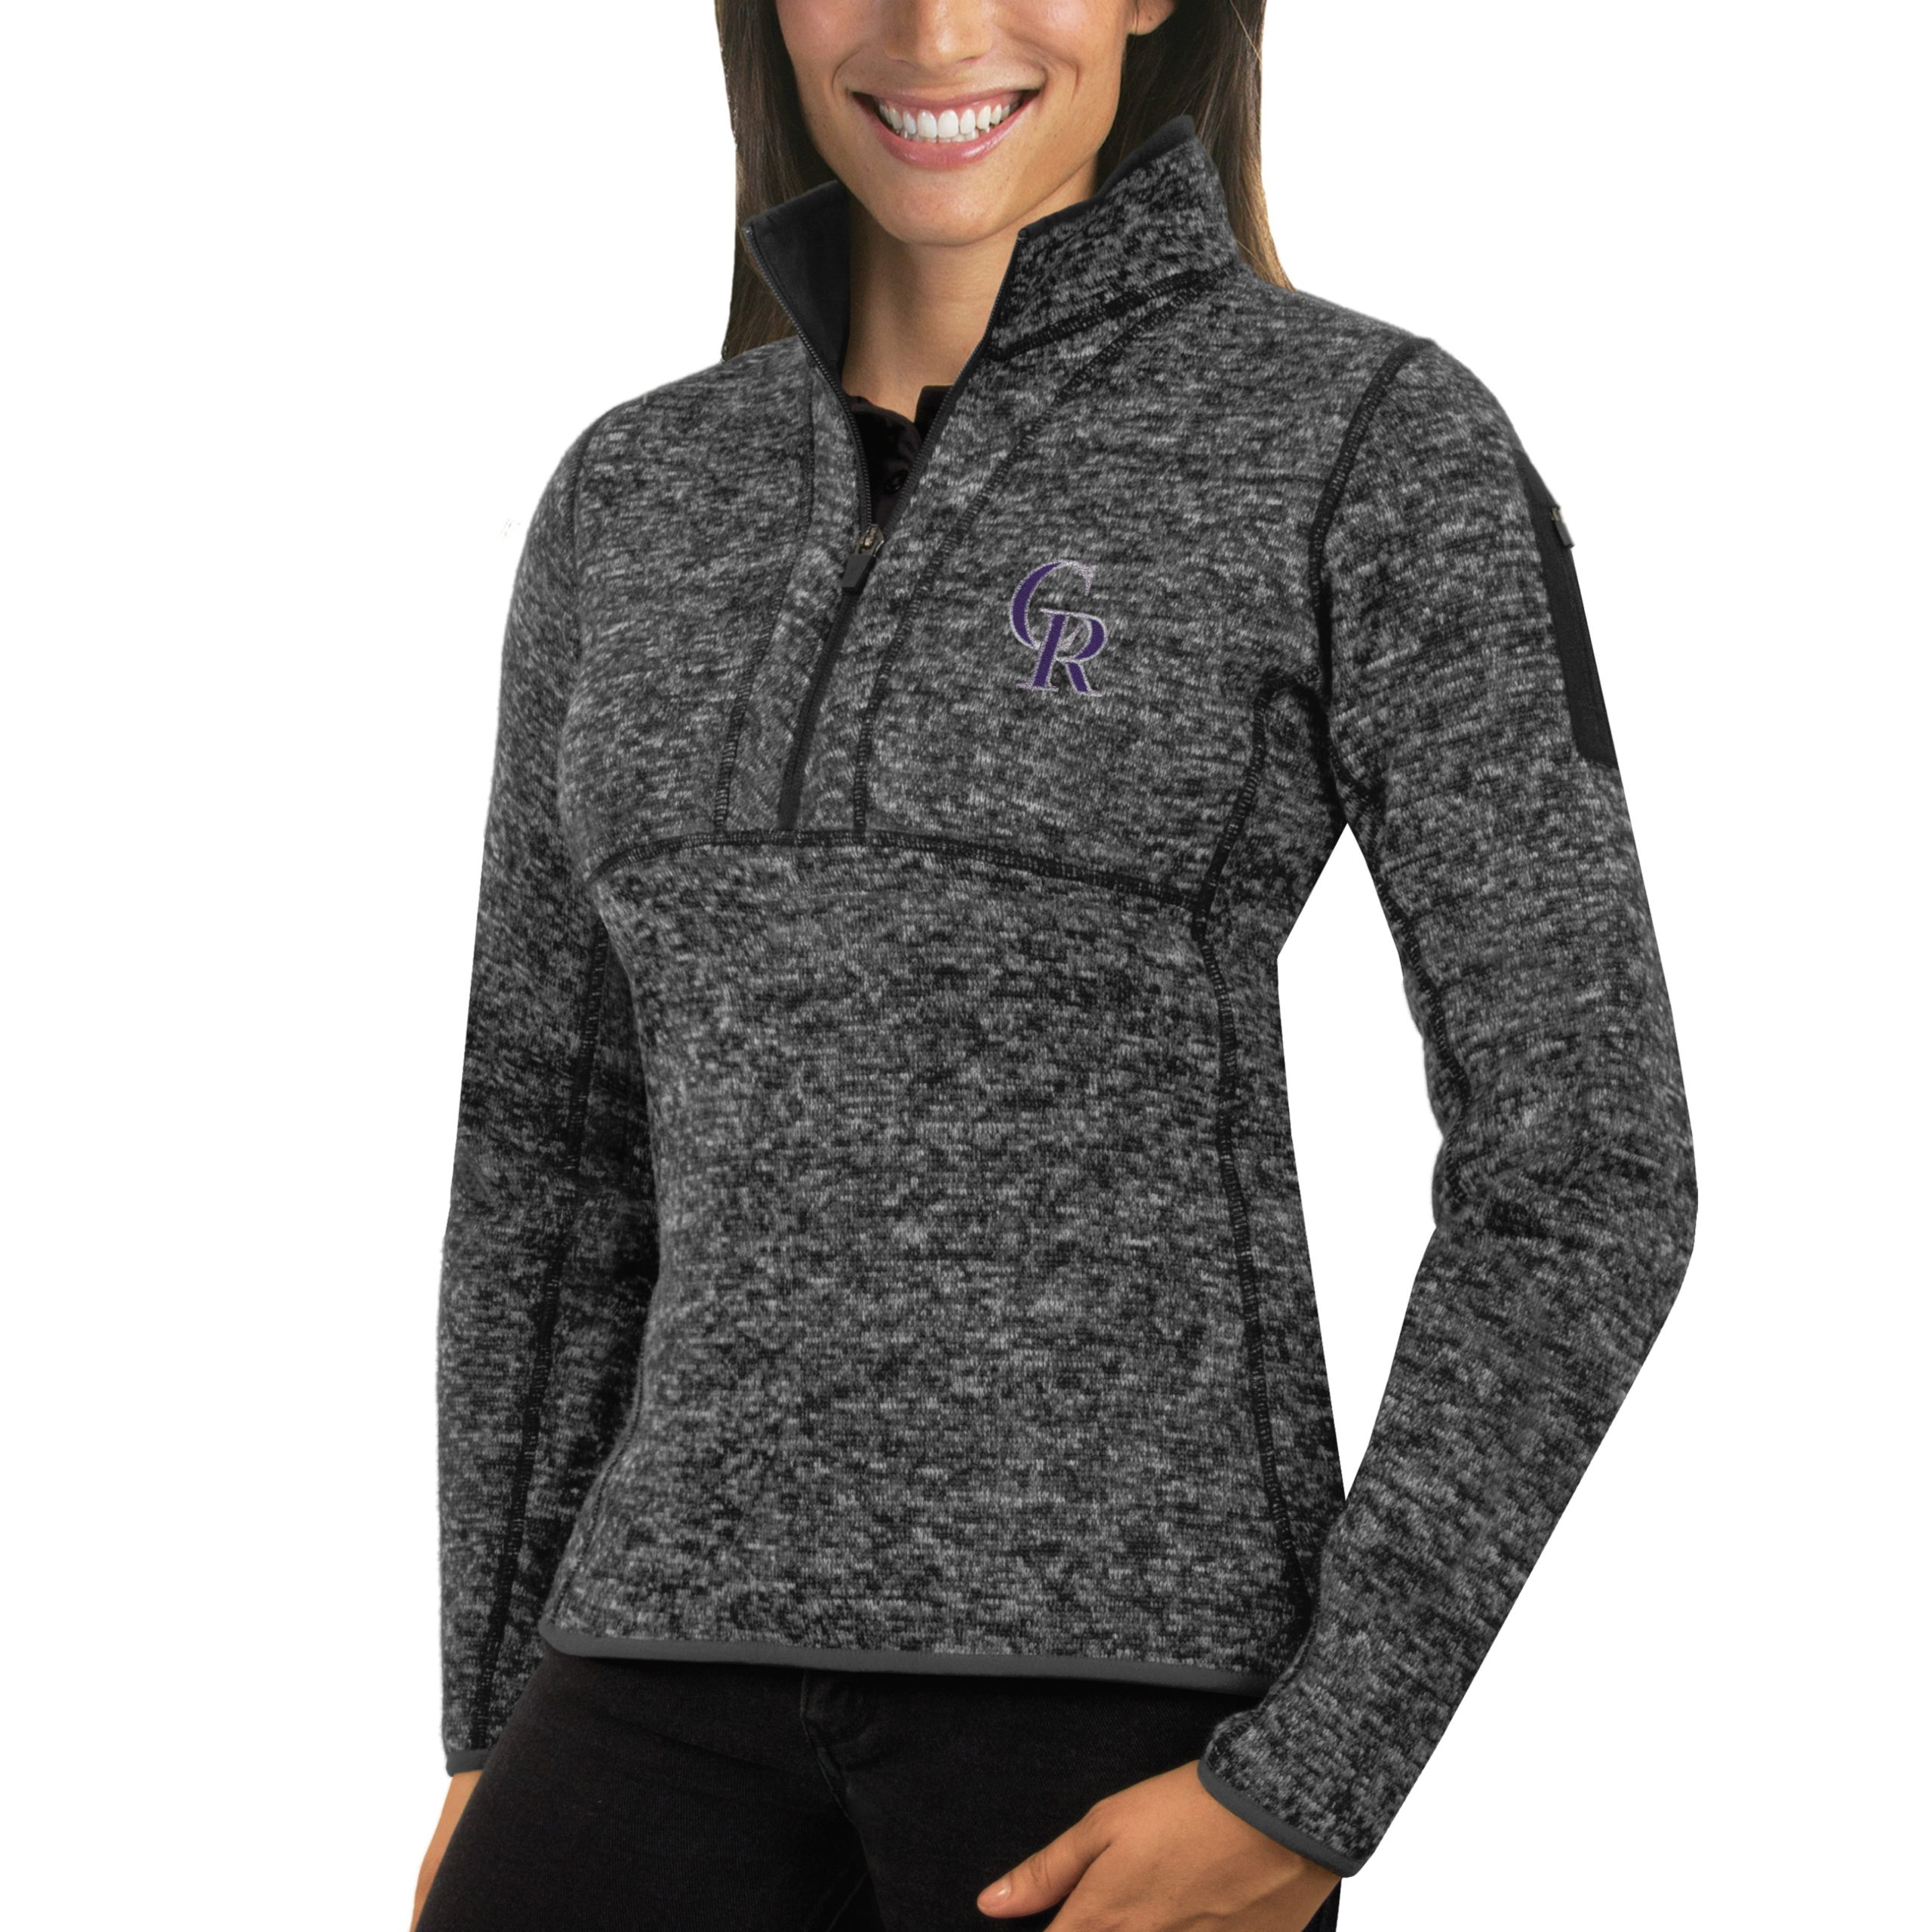 Colorado Rockies Antigua Women's Fortune Half-Zip Pullover Sweater - Heathered Charcoal